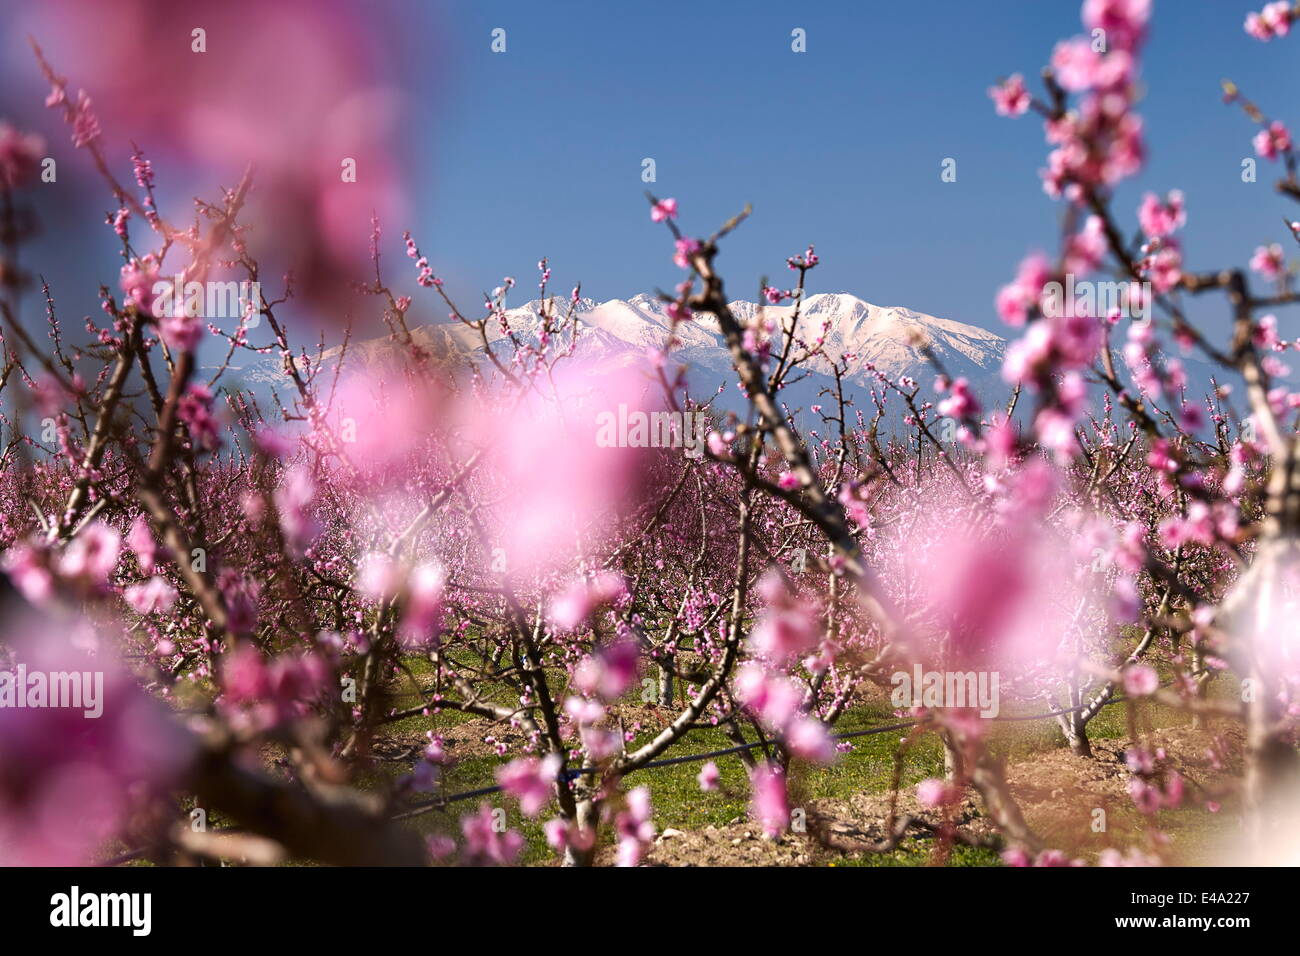 Fruto blossom, el monte Canigou, Pirineos Orientales, Languedoc-Rosellón, Francia, Europa Imagen De Stock